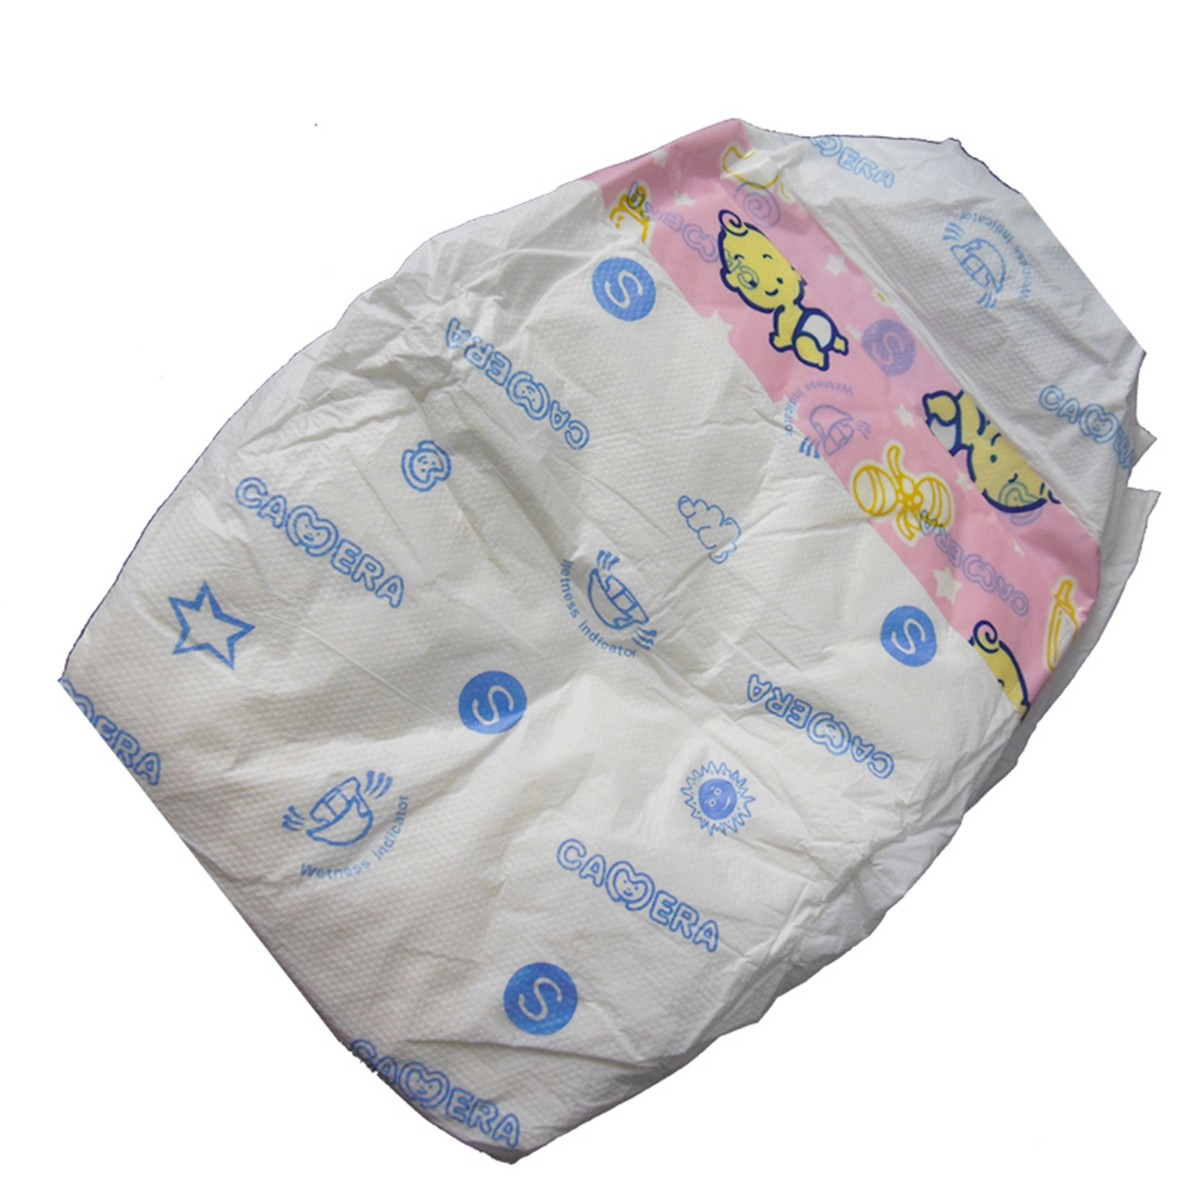 newborn disposable diapers